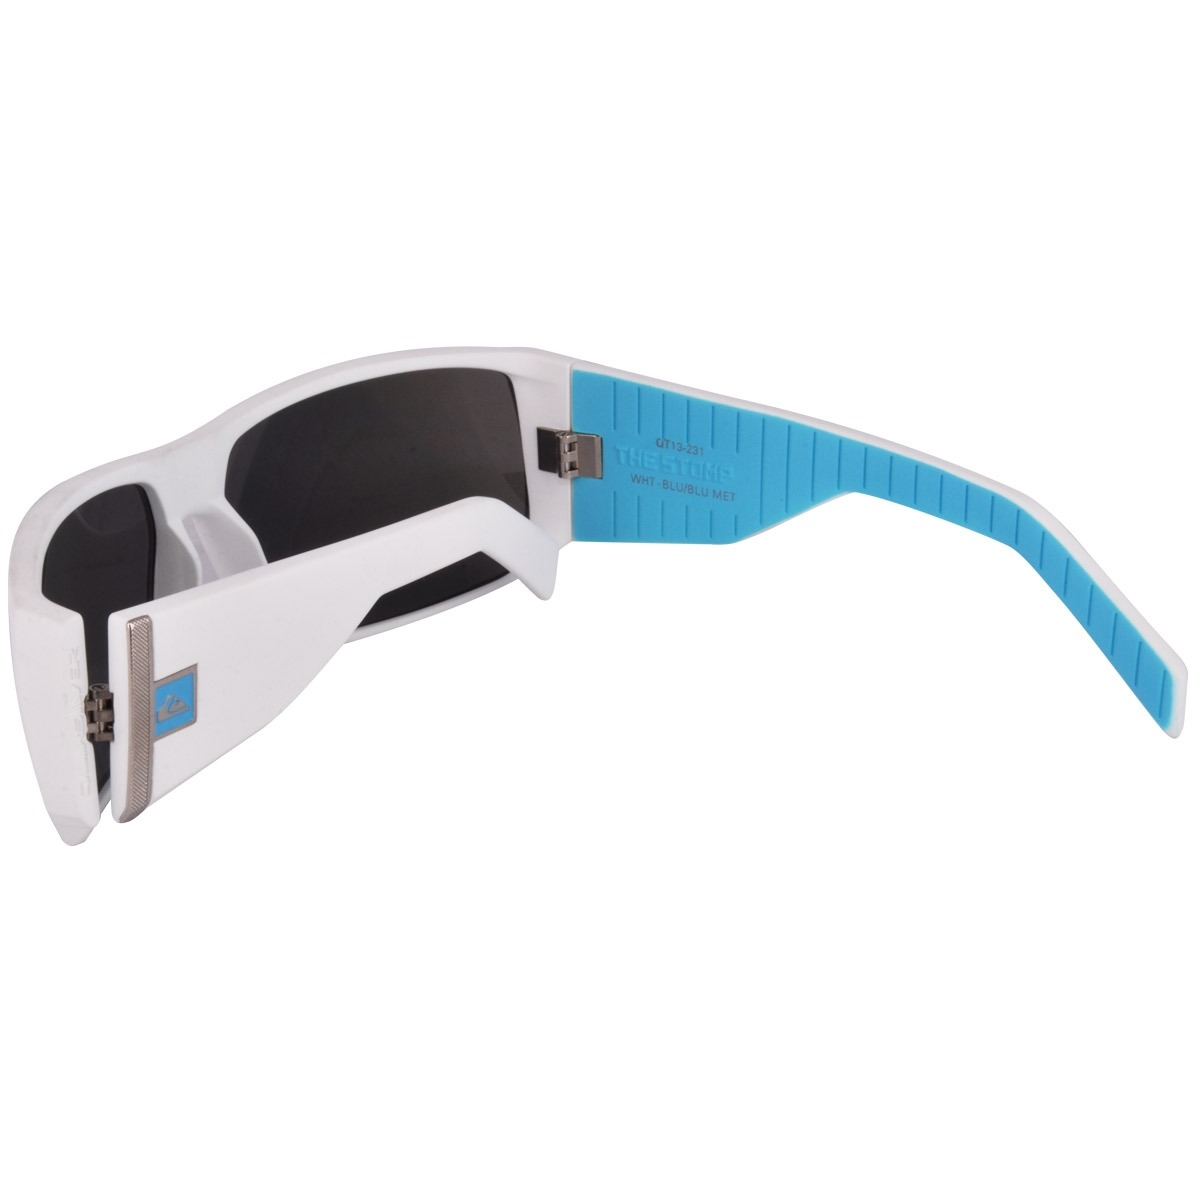 93a0ca3184ed5 óculos quiksilver the stomp branco e azul - cut wave. Carregando zoom.